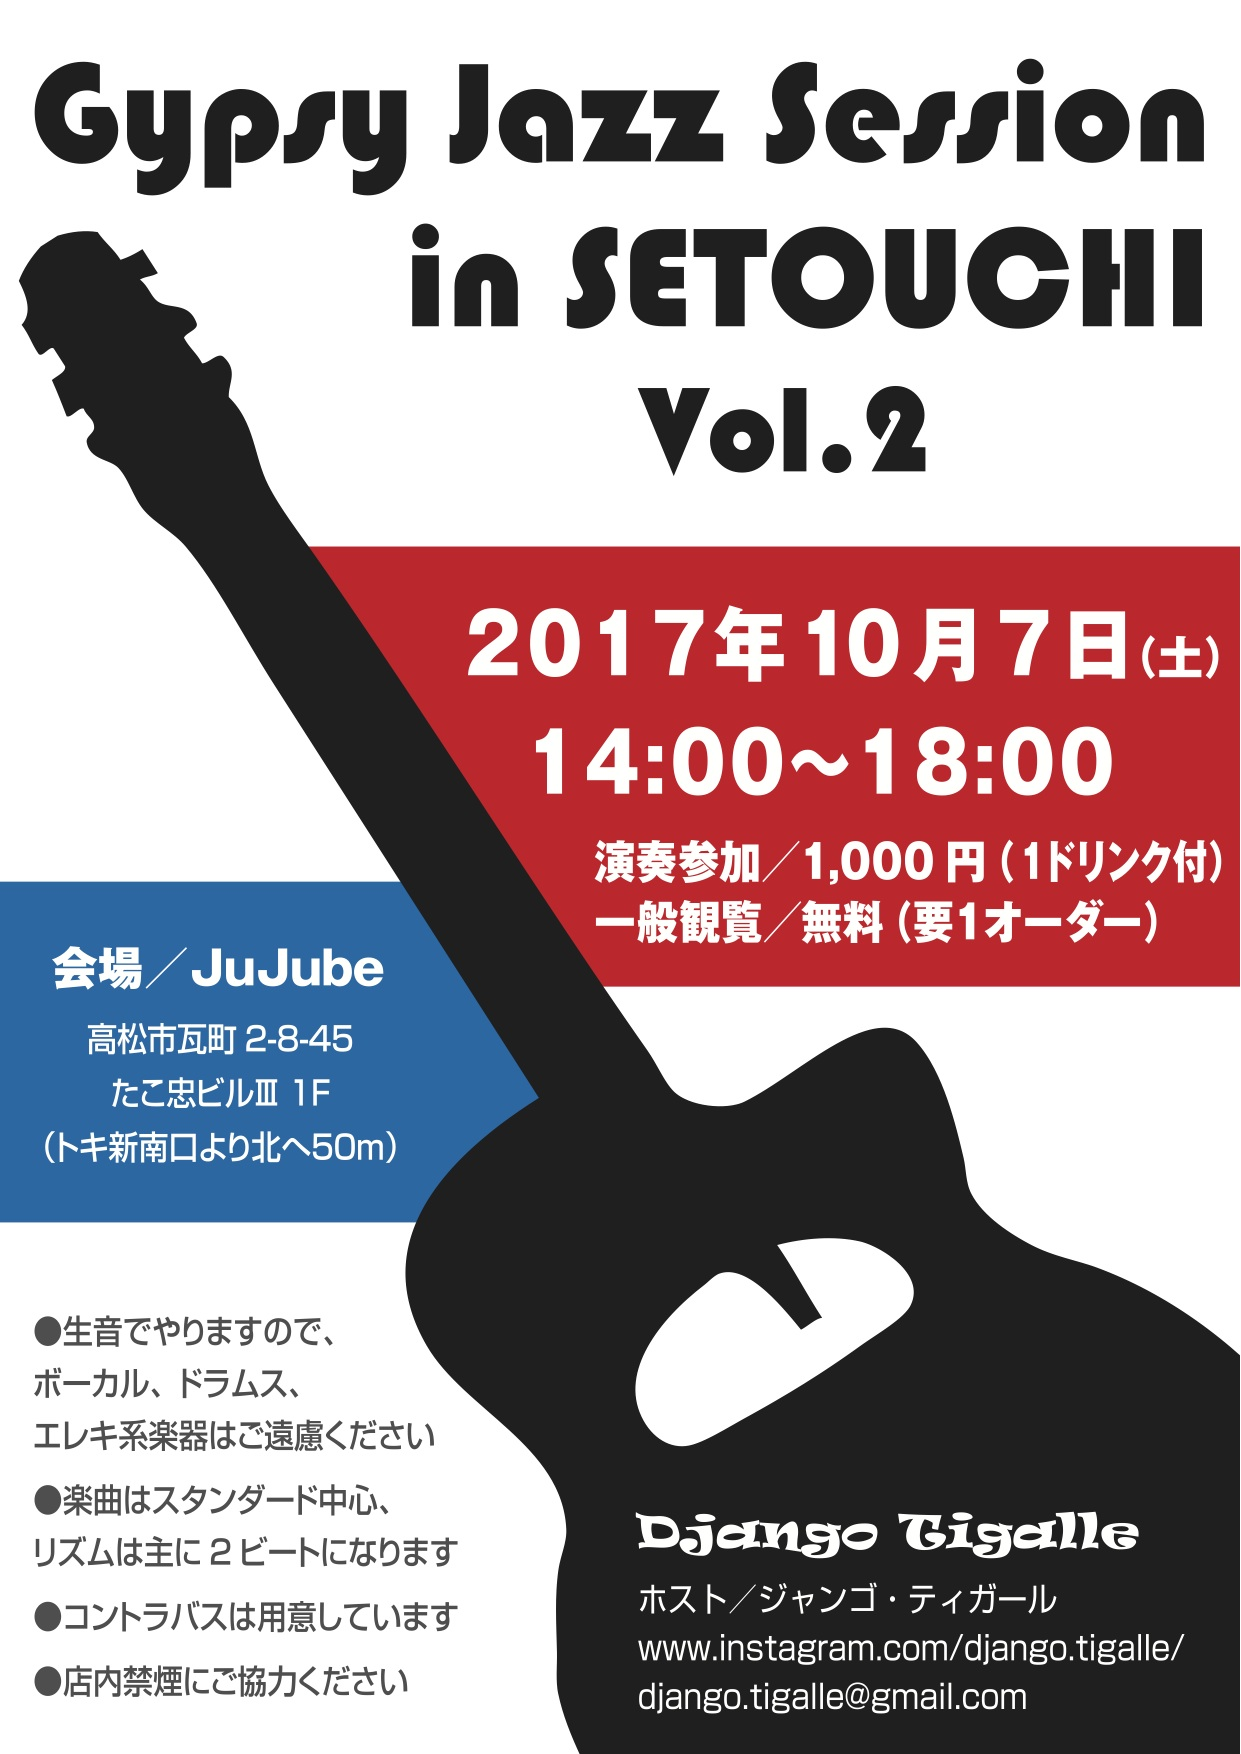 Setouchi Session